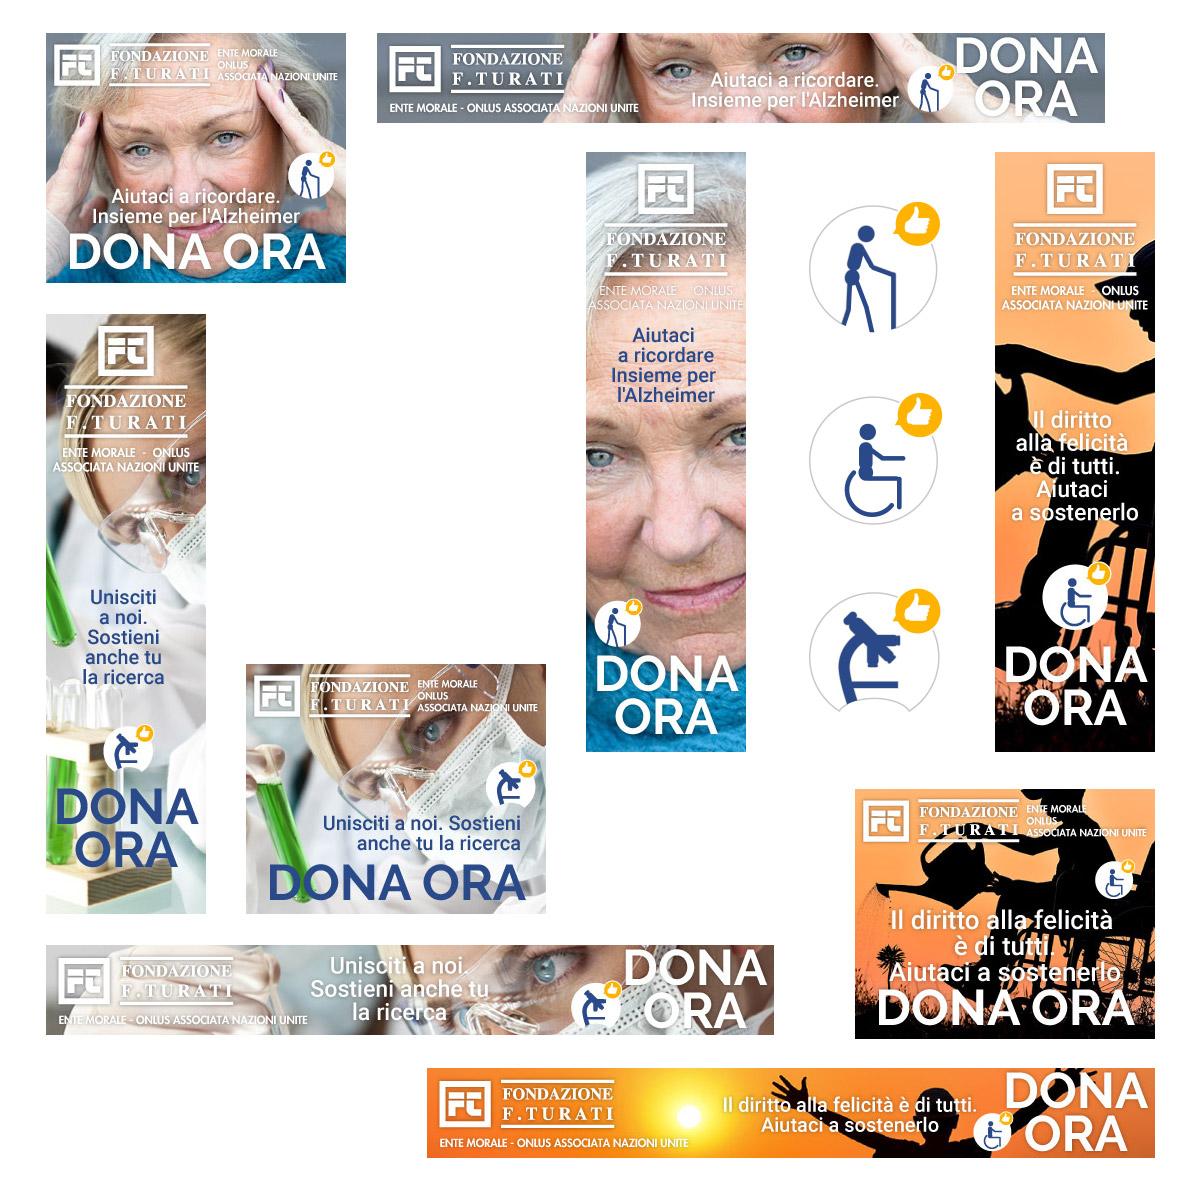 Campagne Google e Facebook – Fondazione Turati